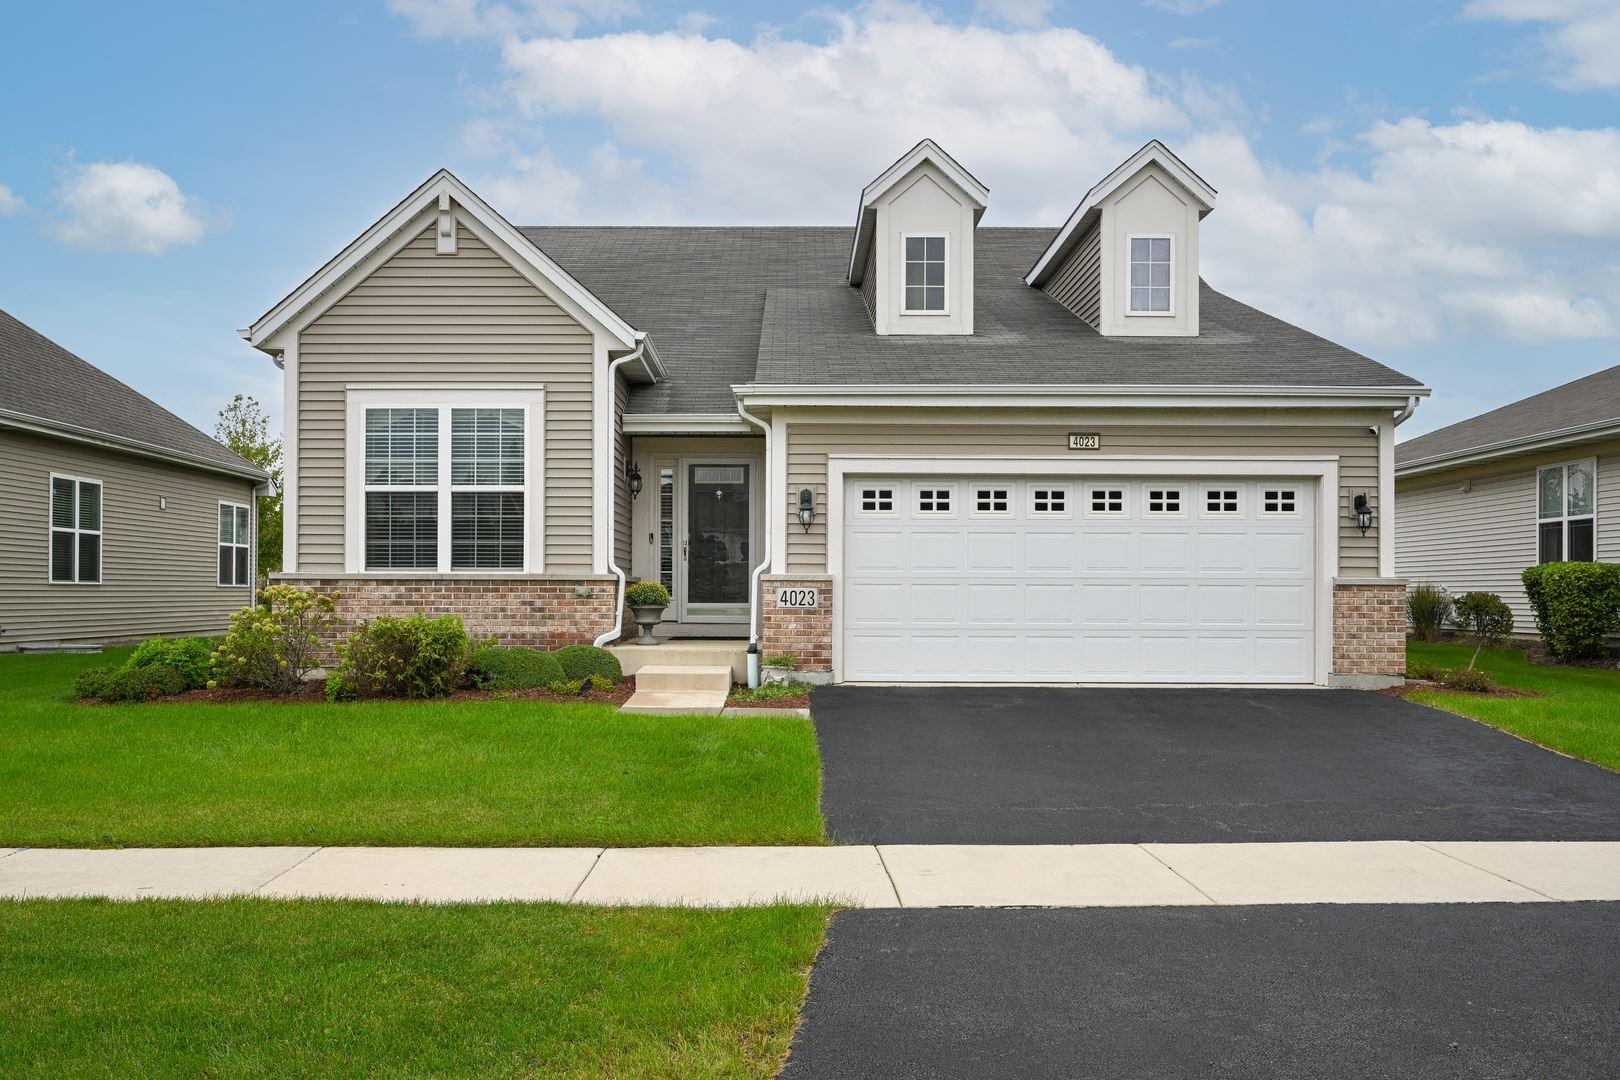 Photo of 4023 Idlewild Lane, Naperville, IL 60564 (MLS # 11236423)